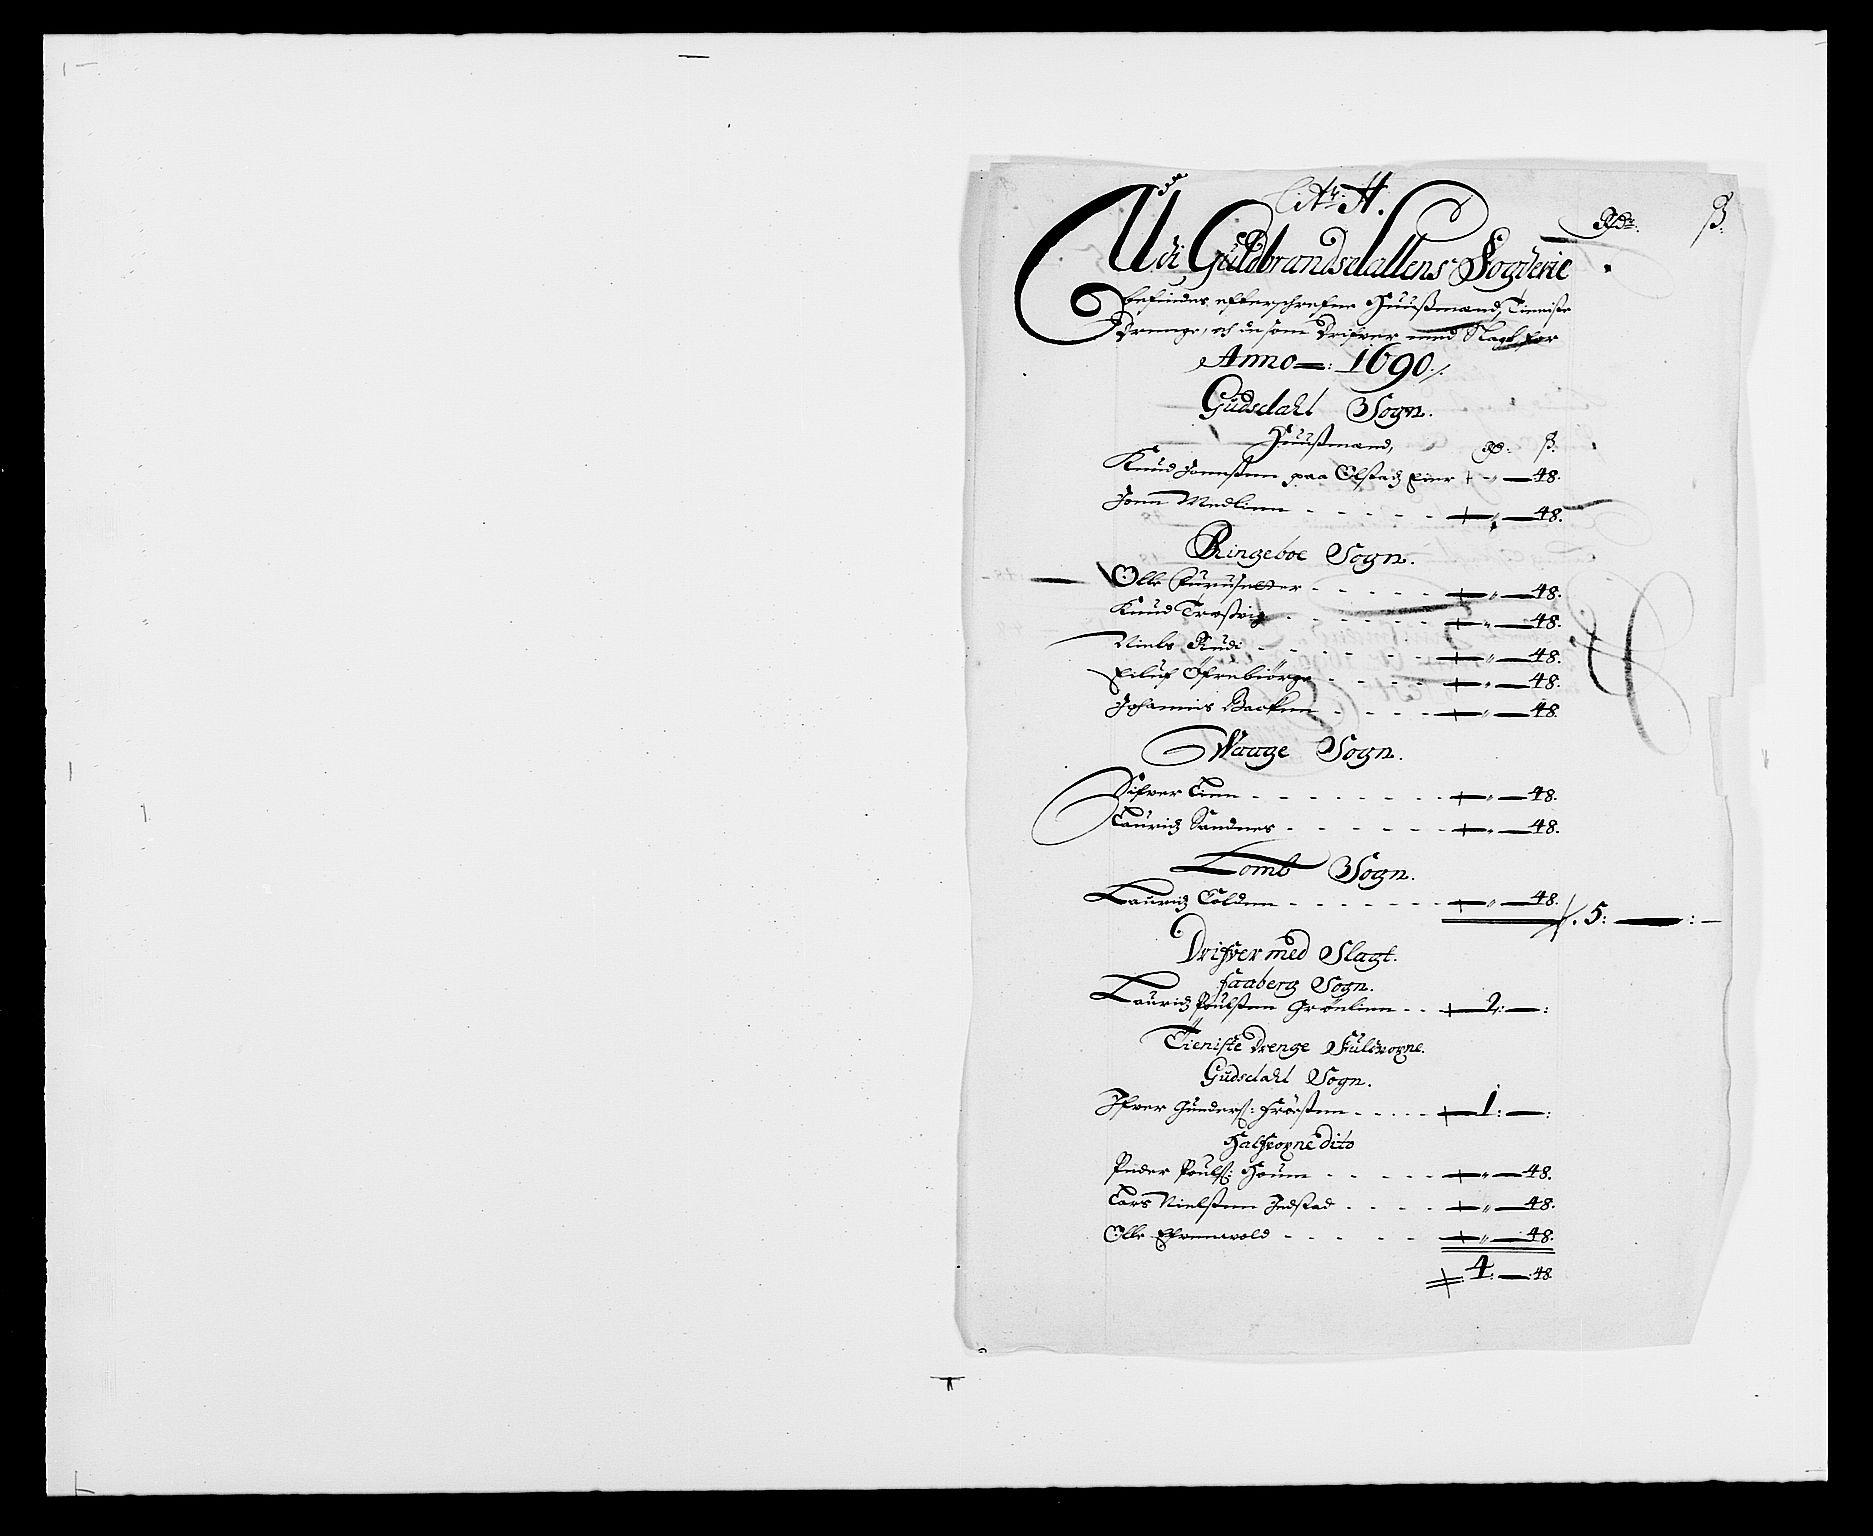 RA, Rentekammeret inntil 1814, Reviderte regnskaper, Fogderegnskap, R17/L1165: Fogderegnskap Gudbrandsdal, 1690-1692, s. 144